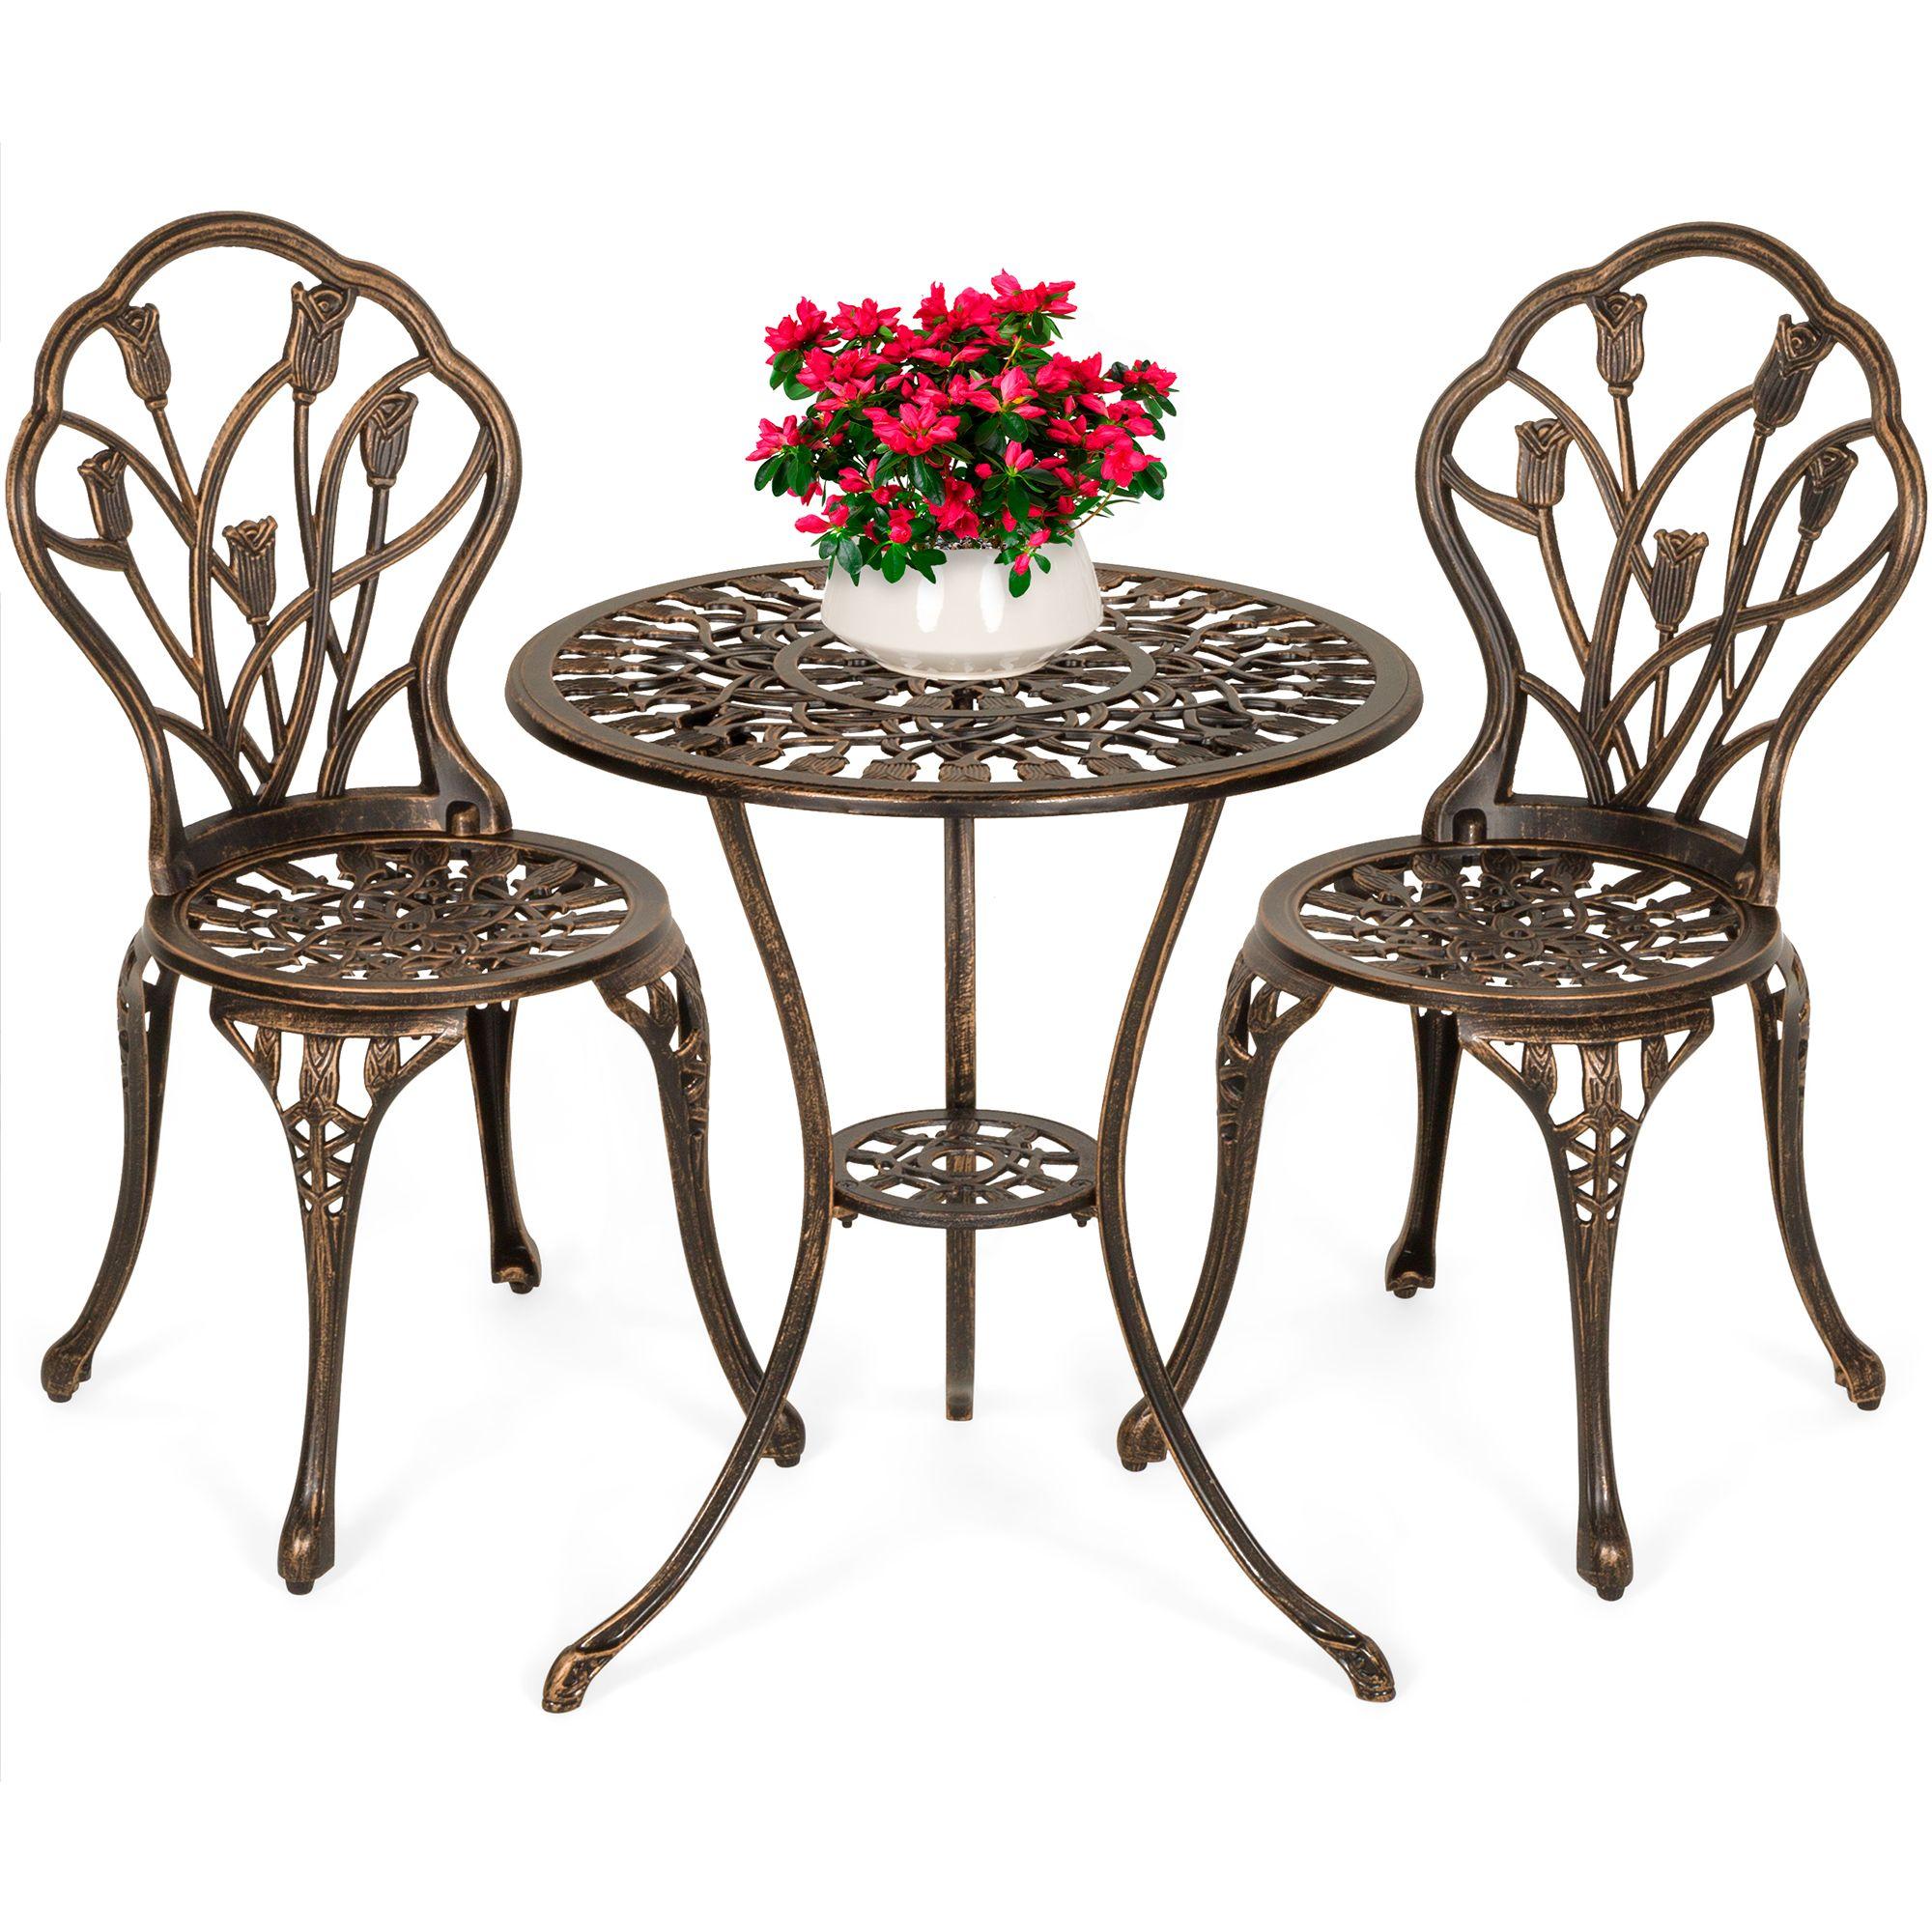 Best Choice Products 10 Piece Cast Aluminum Patio Bistro Furniture ...